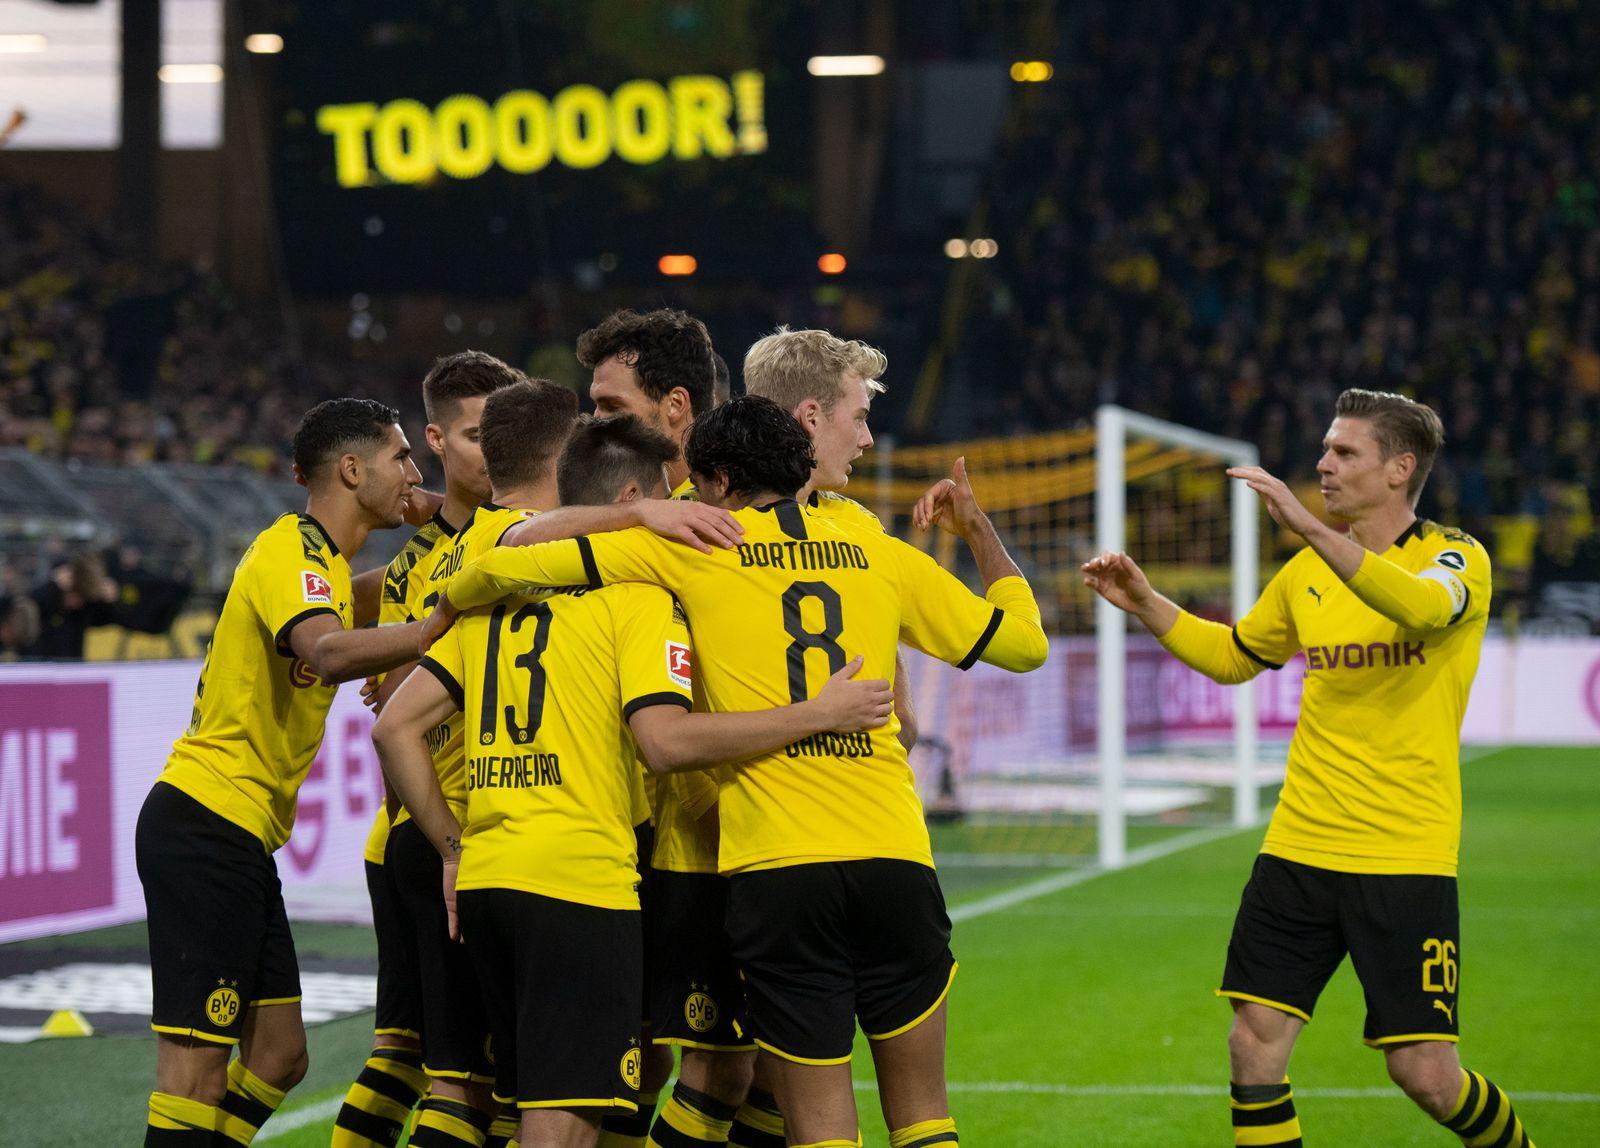 Borussia Dortmund - VfL Wolfsburg